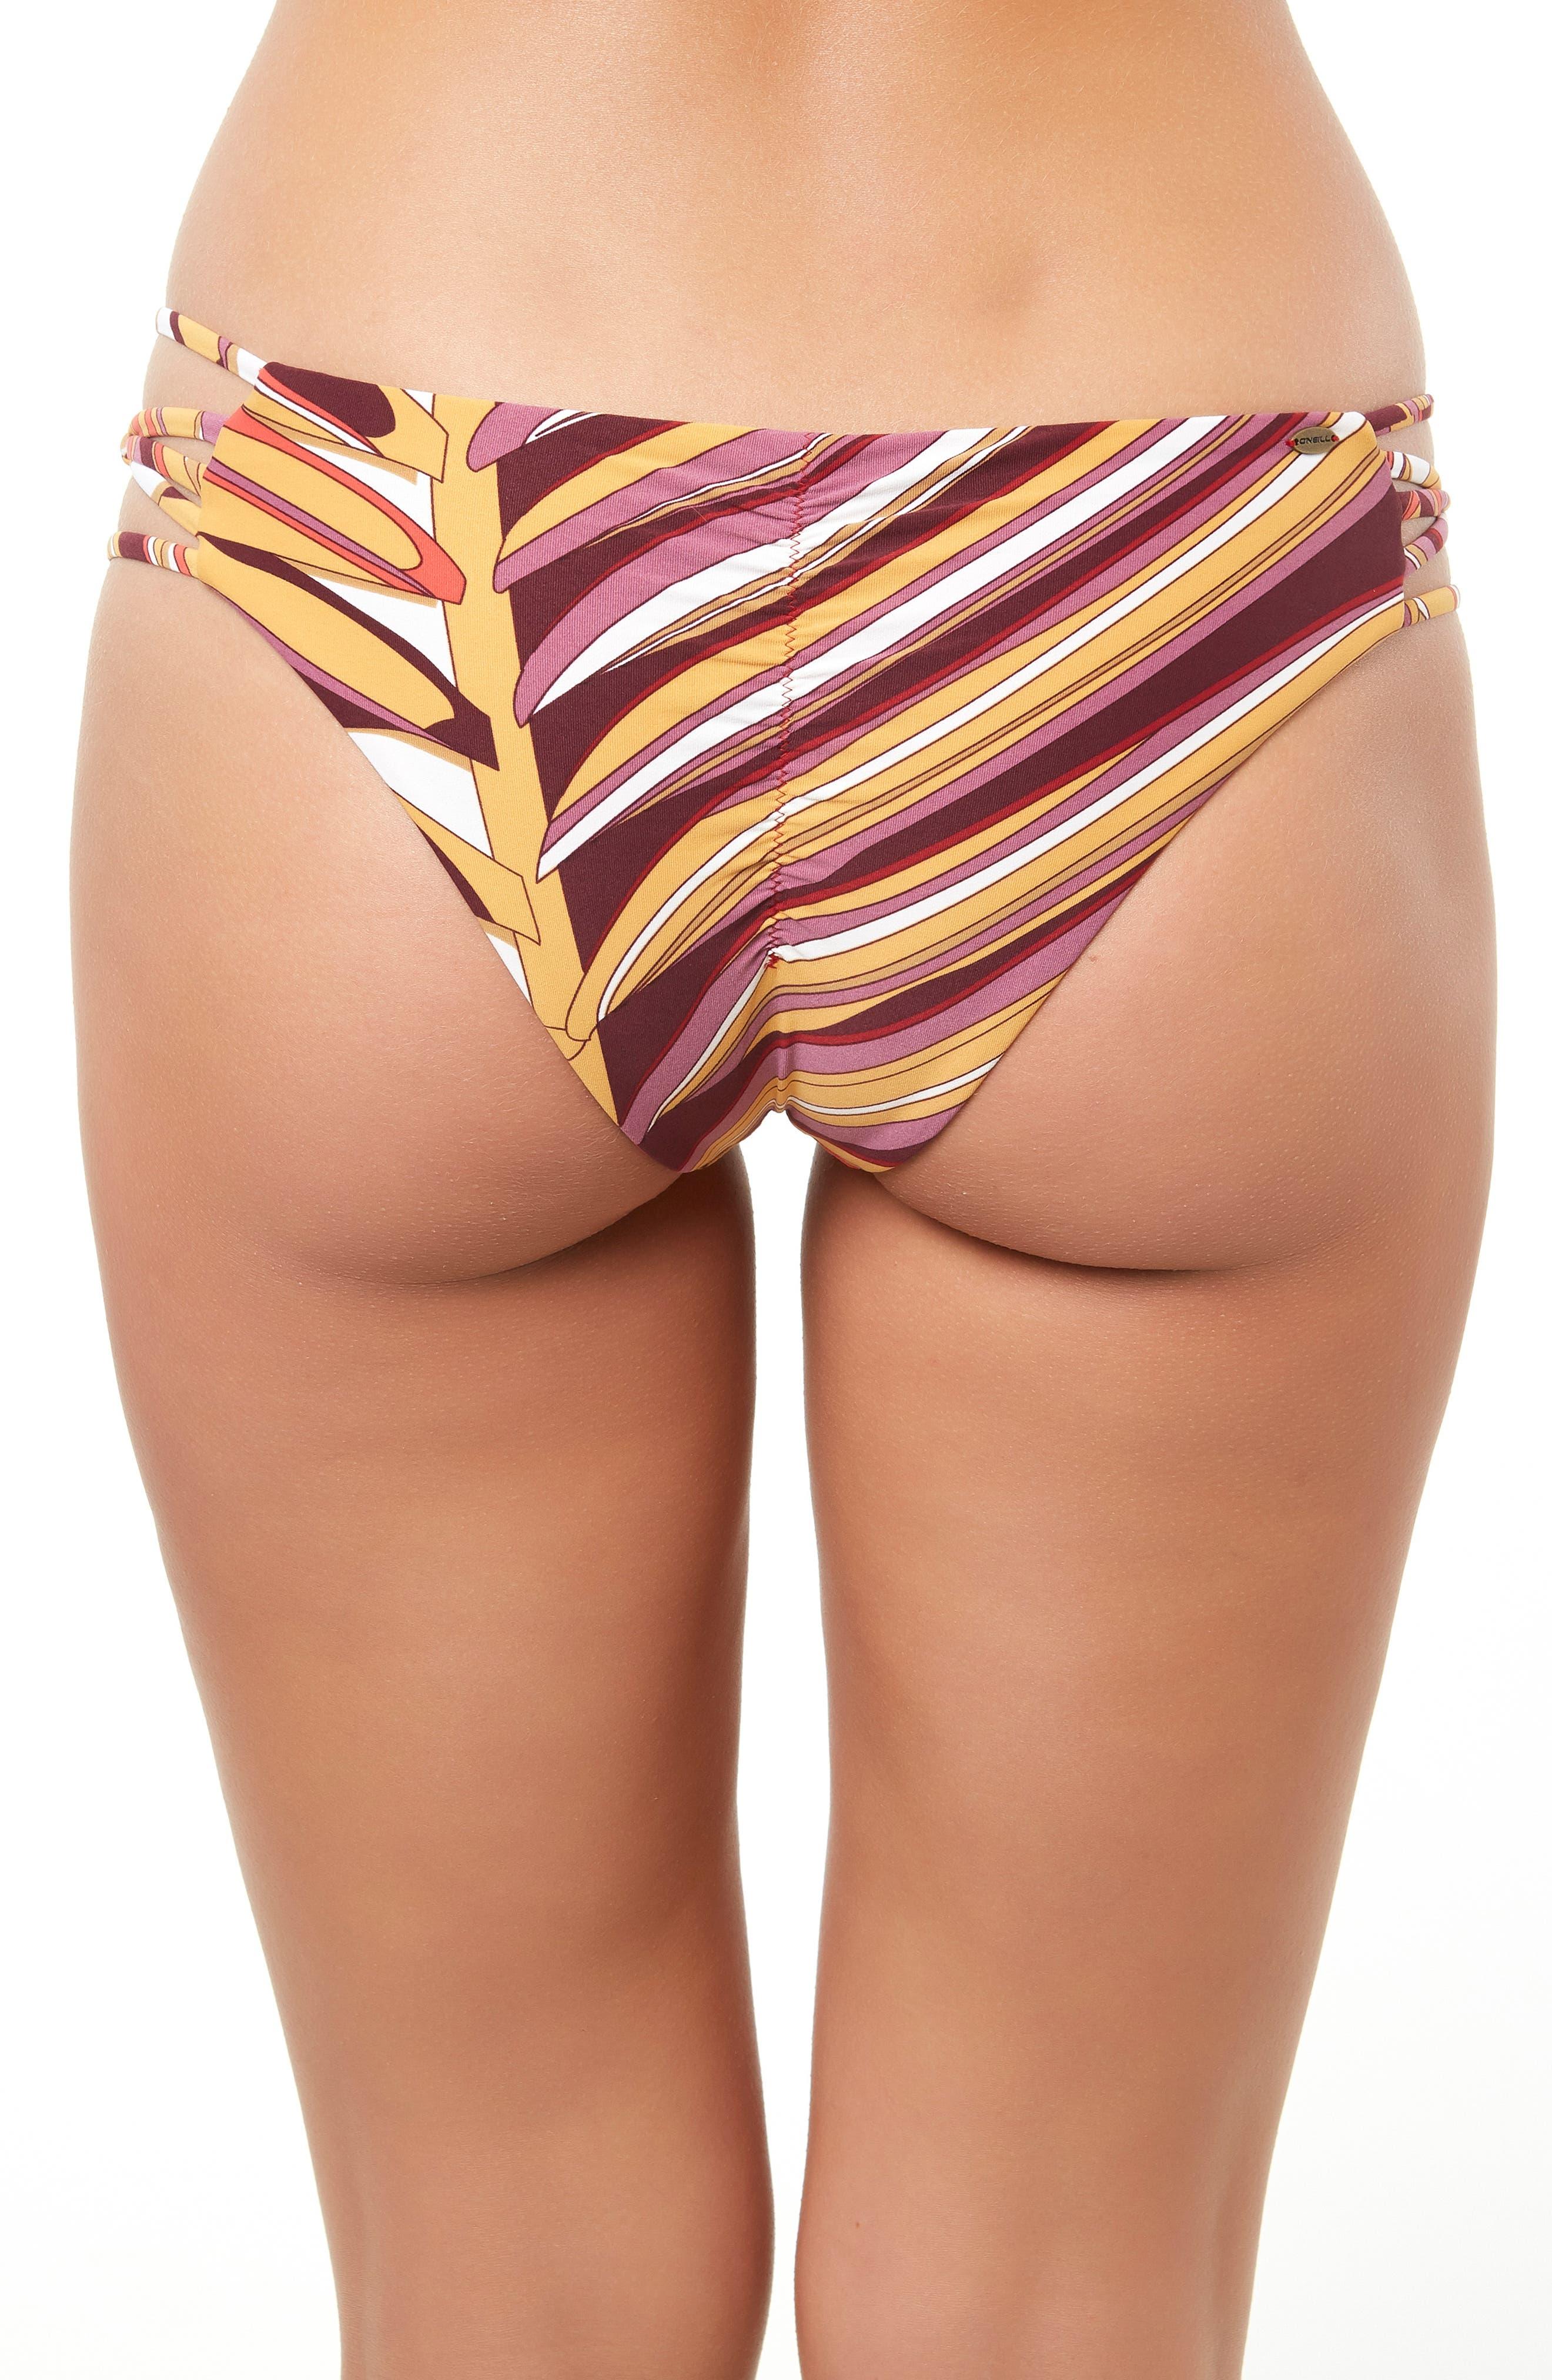 Anacapa Strappy Hipster Bikini Bottoms,                             Alternate thumbnail 4, color,                             PURPLE MAUVE